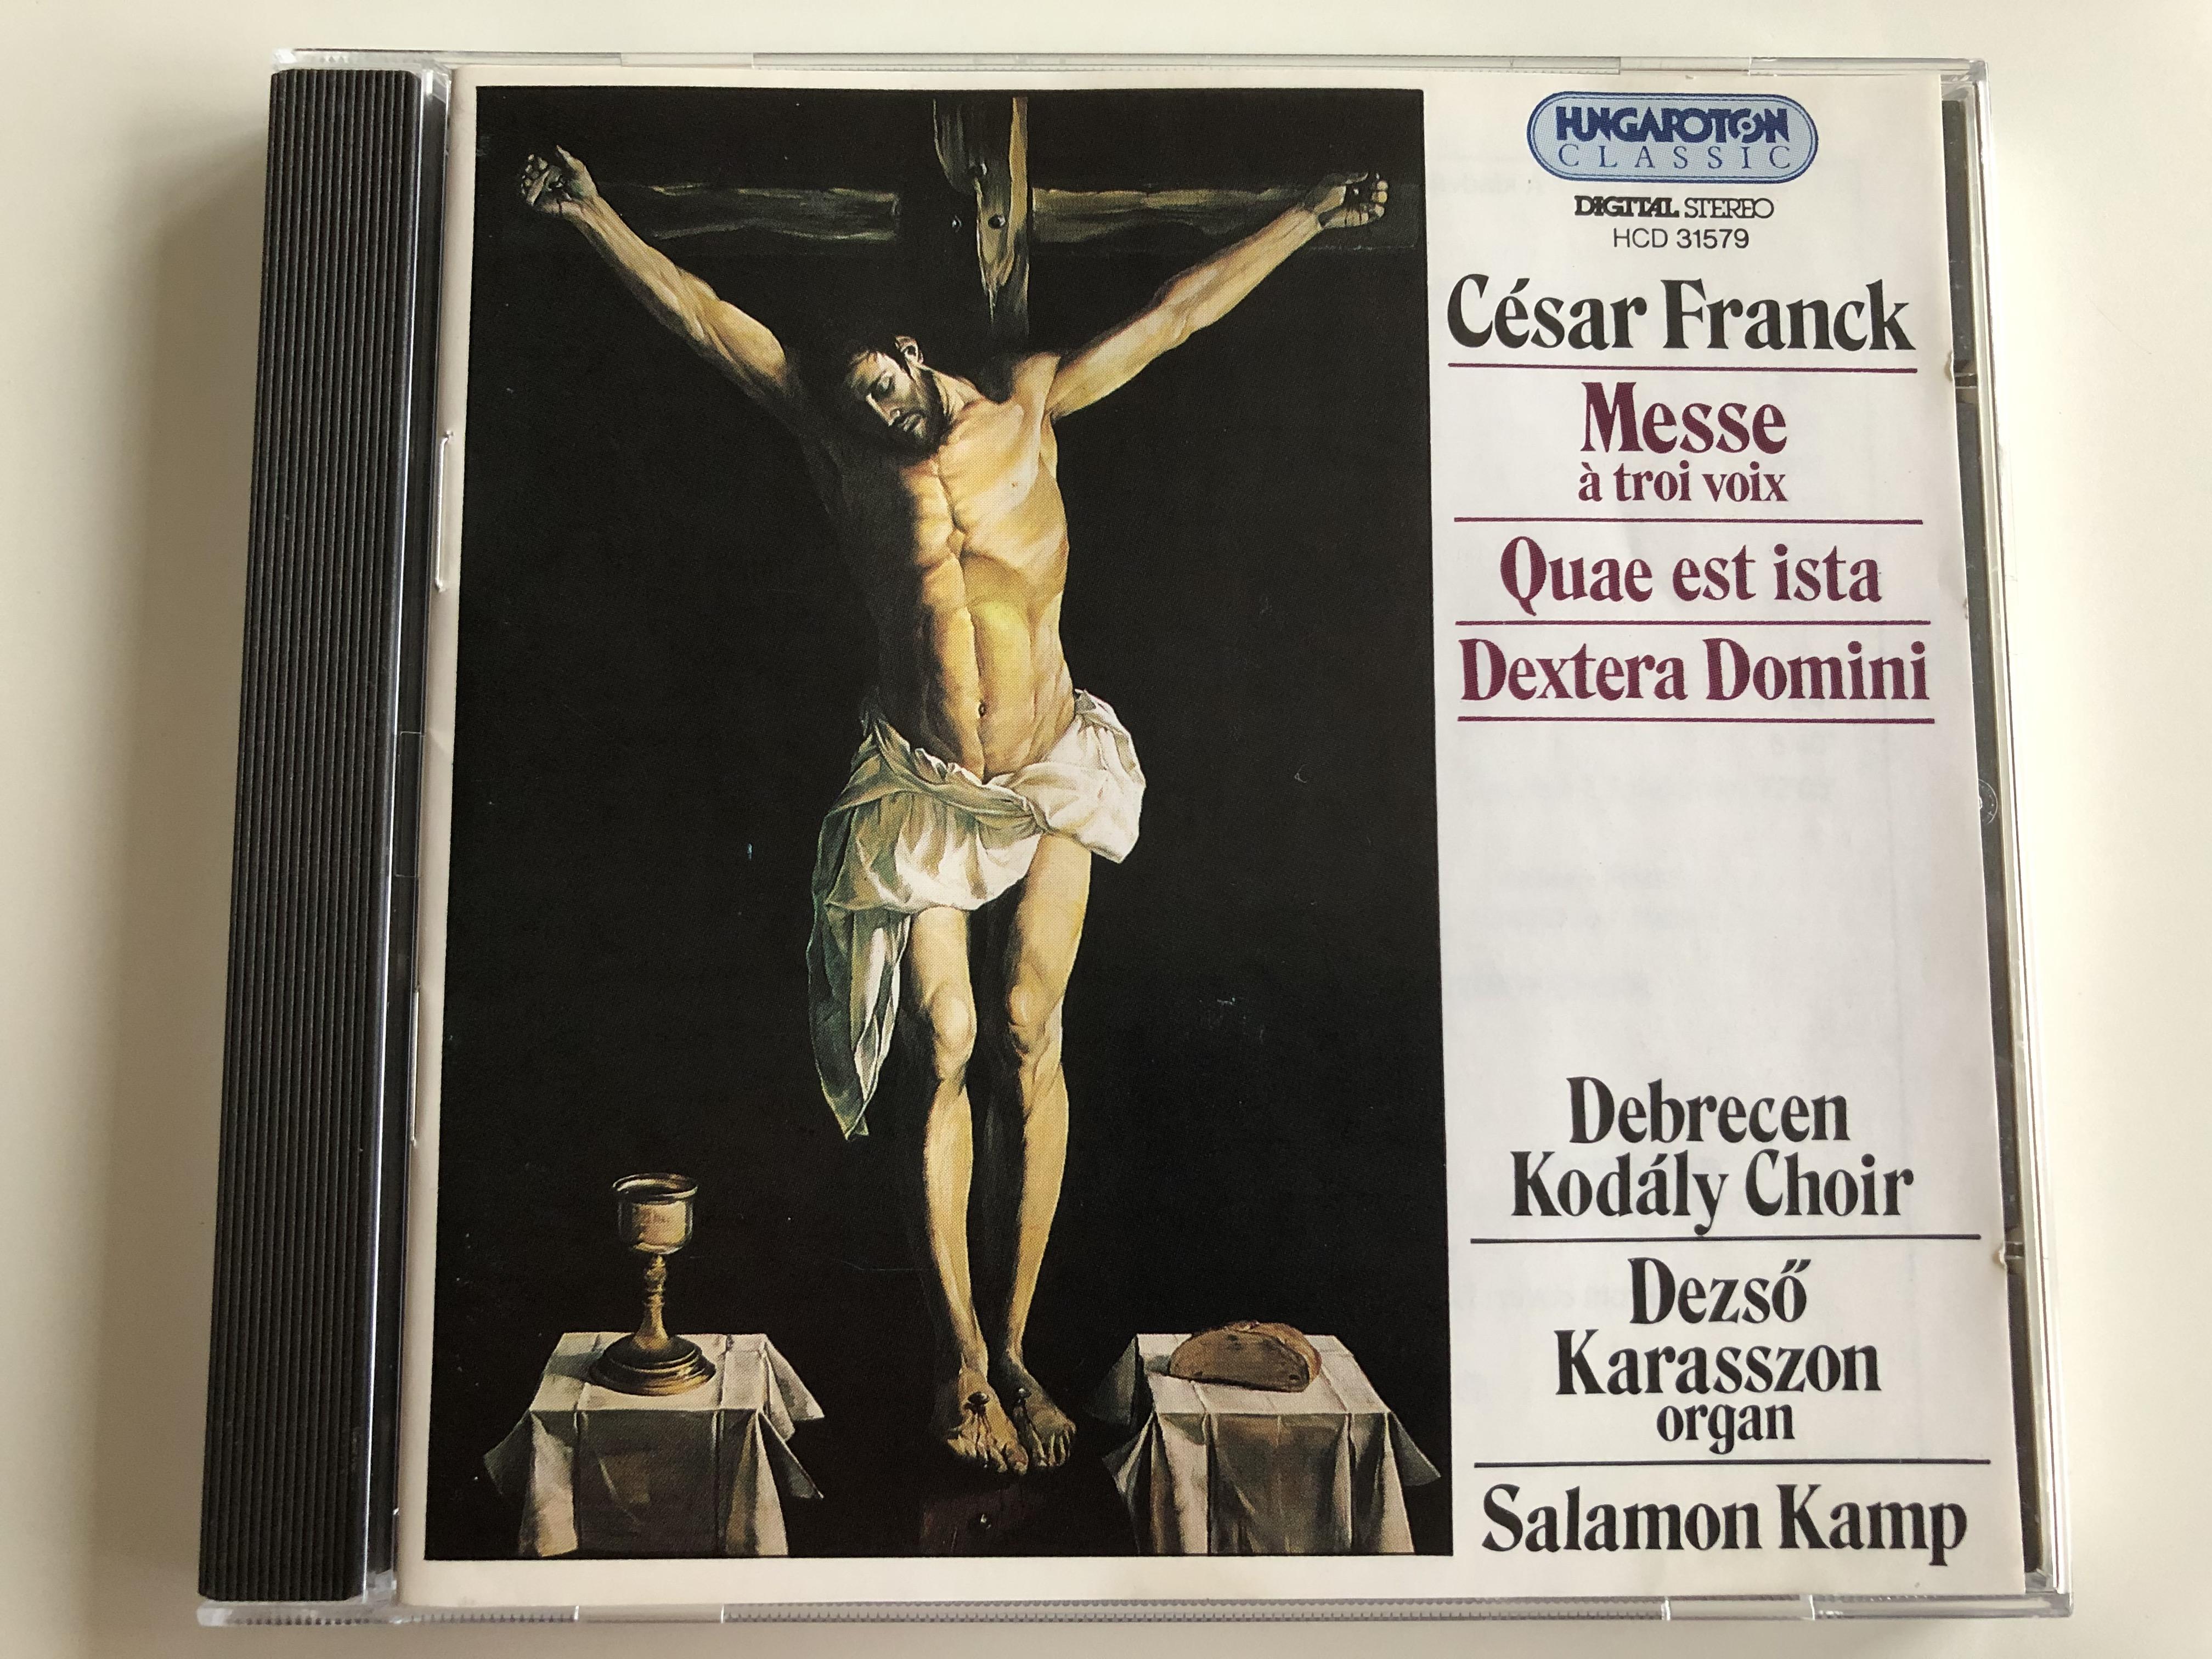 c-sar-franck-messe-a-troi-voix-quae-est-ista-dextera-domini-debrecen-kodaly-choir-dezso-karasszon-organ-salamon-kamp-hungaroton-classic-audio-cd-1995-stereo-hcd-31579-1-.jpg